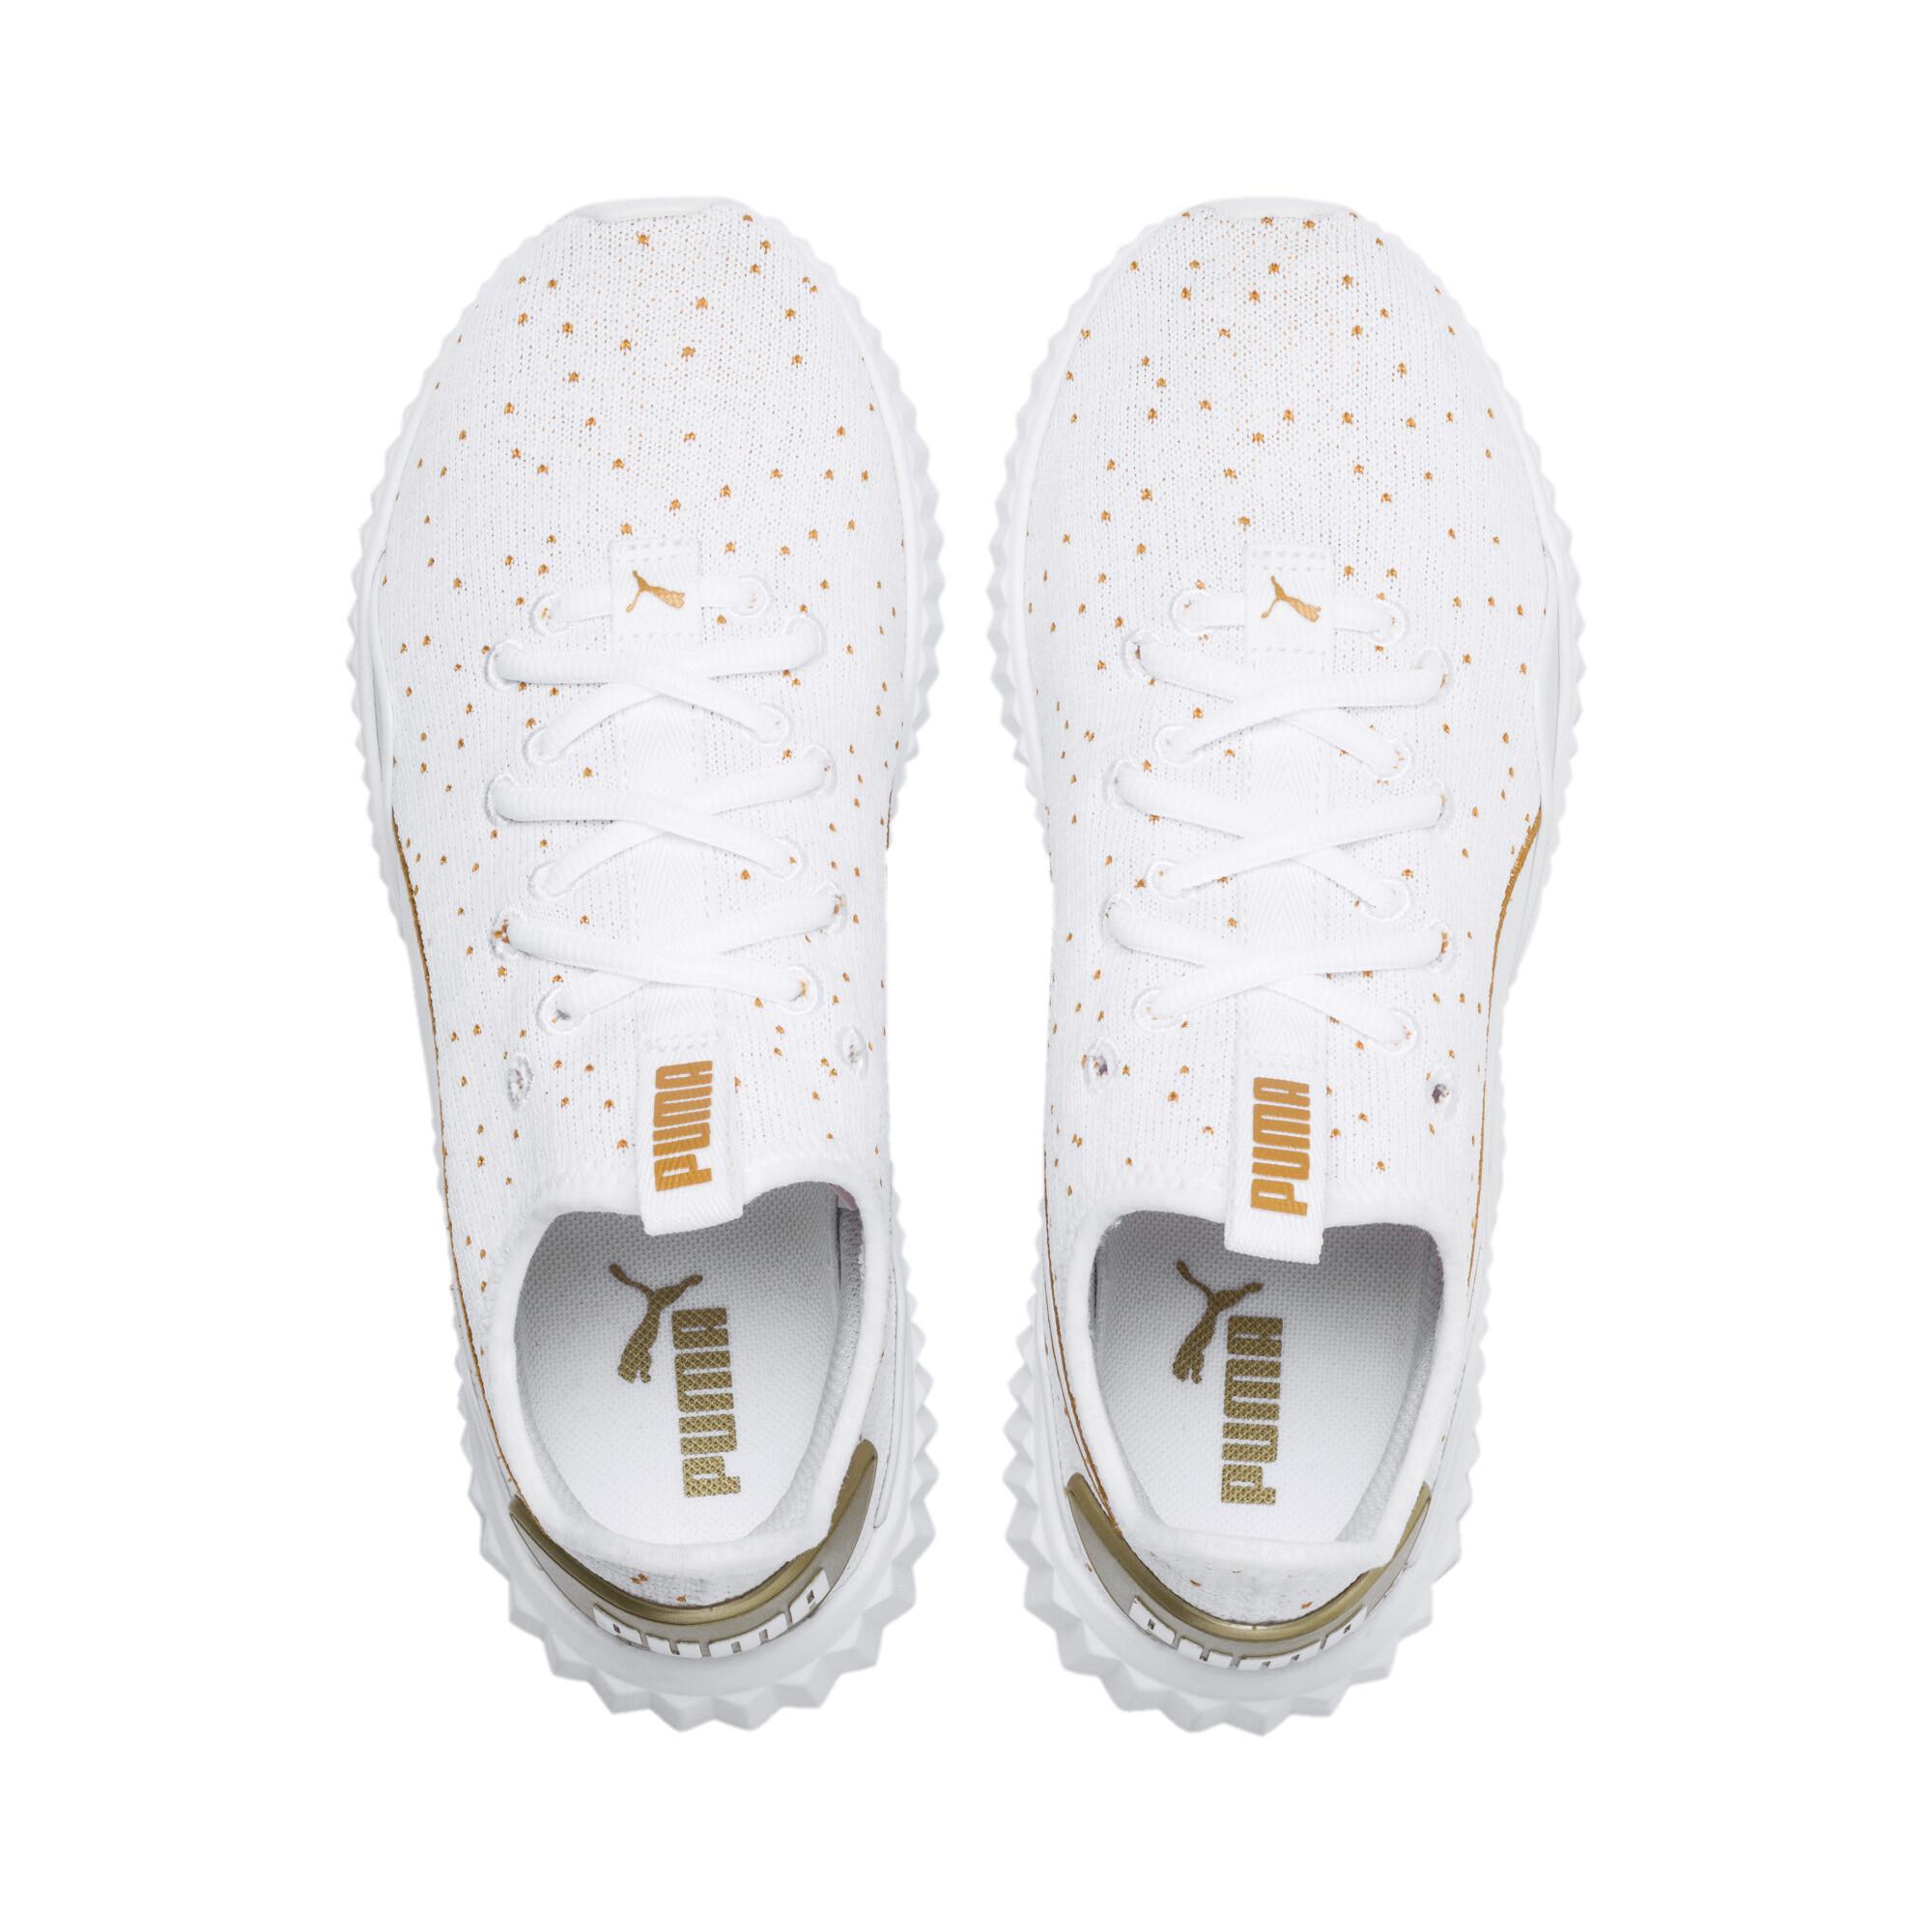 Image Puma Defy Speckle Women's Training Shoes #6